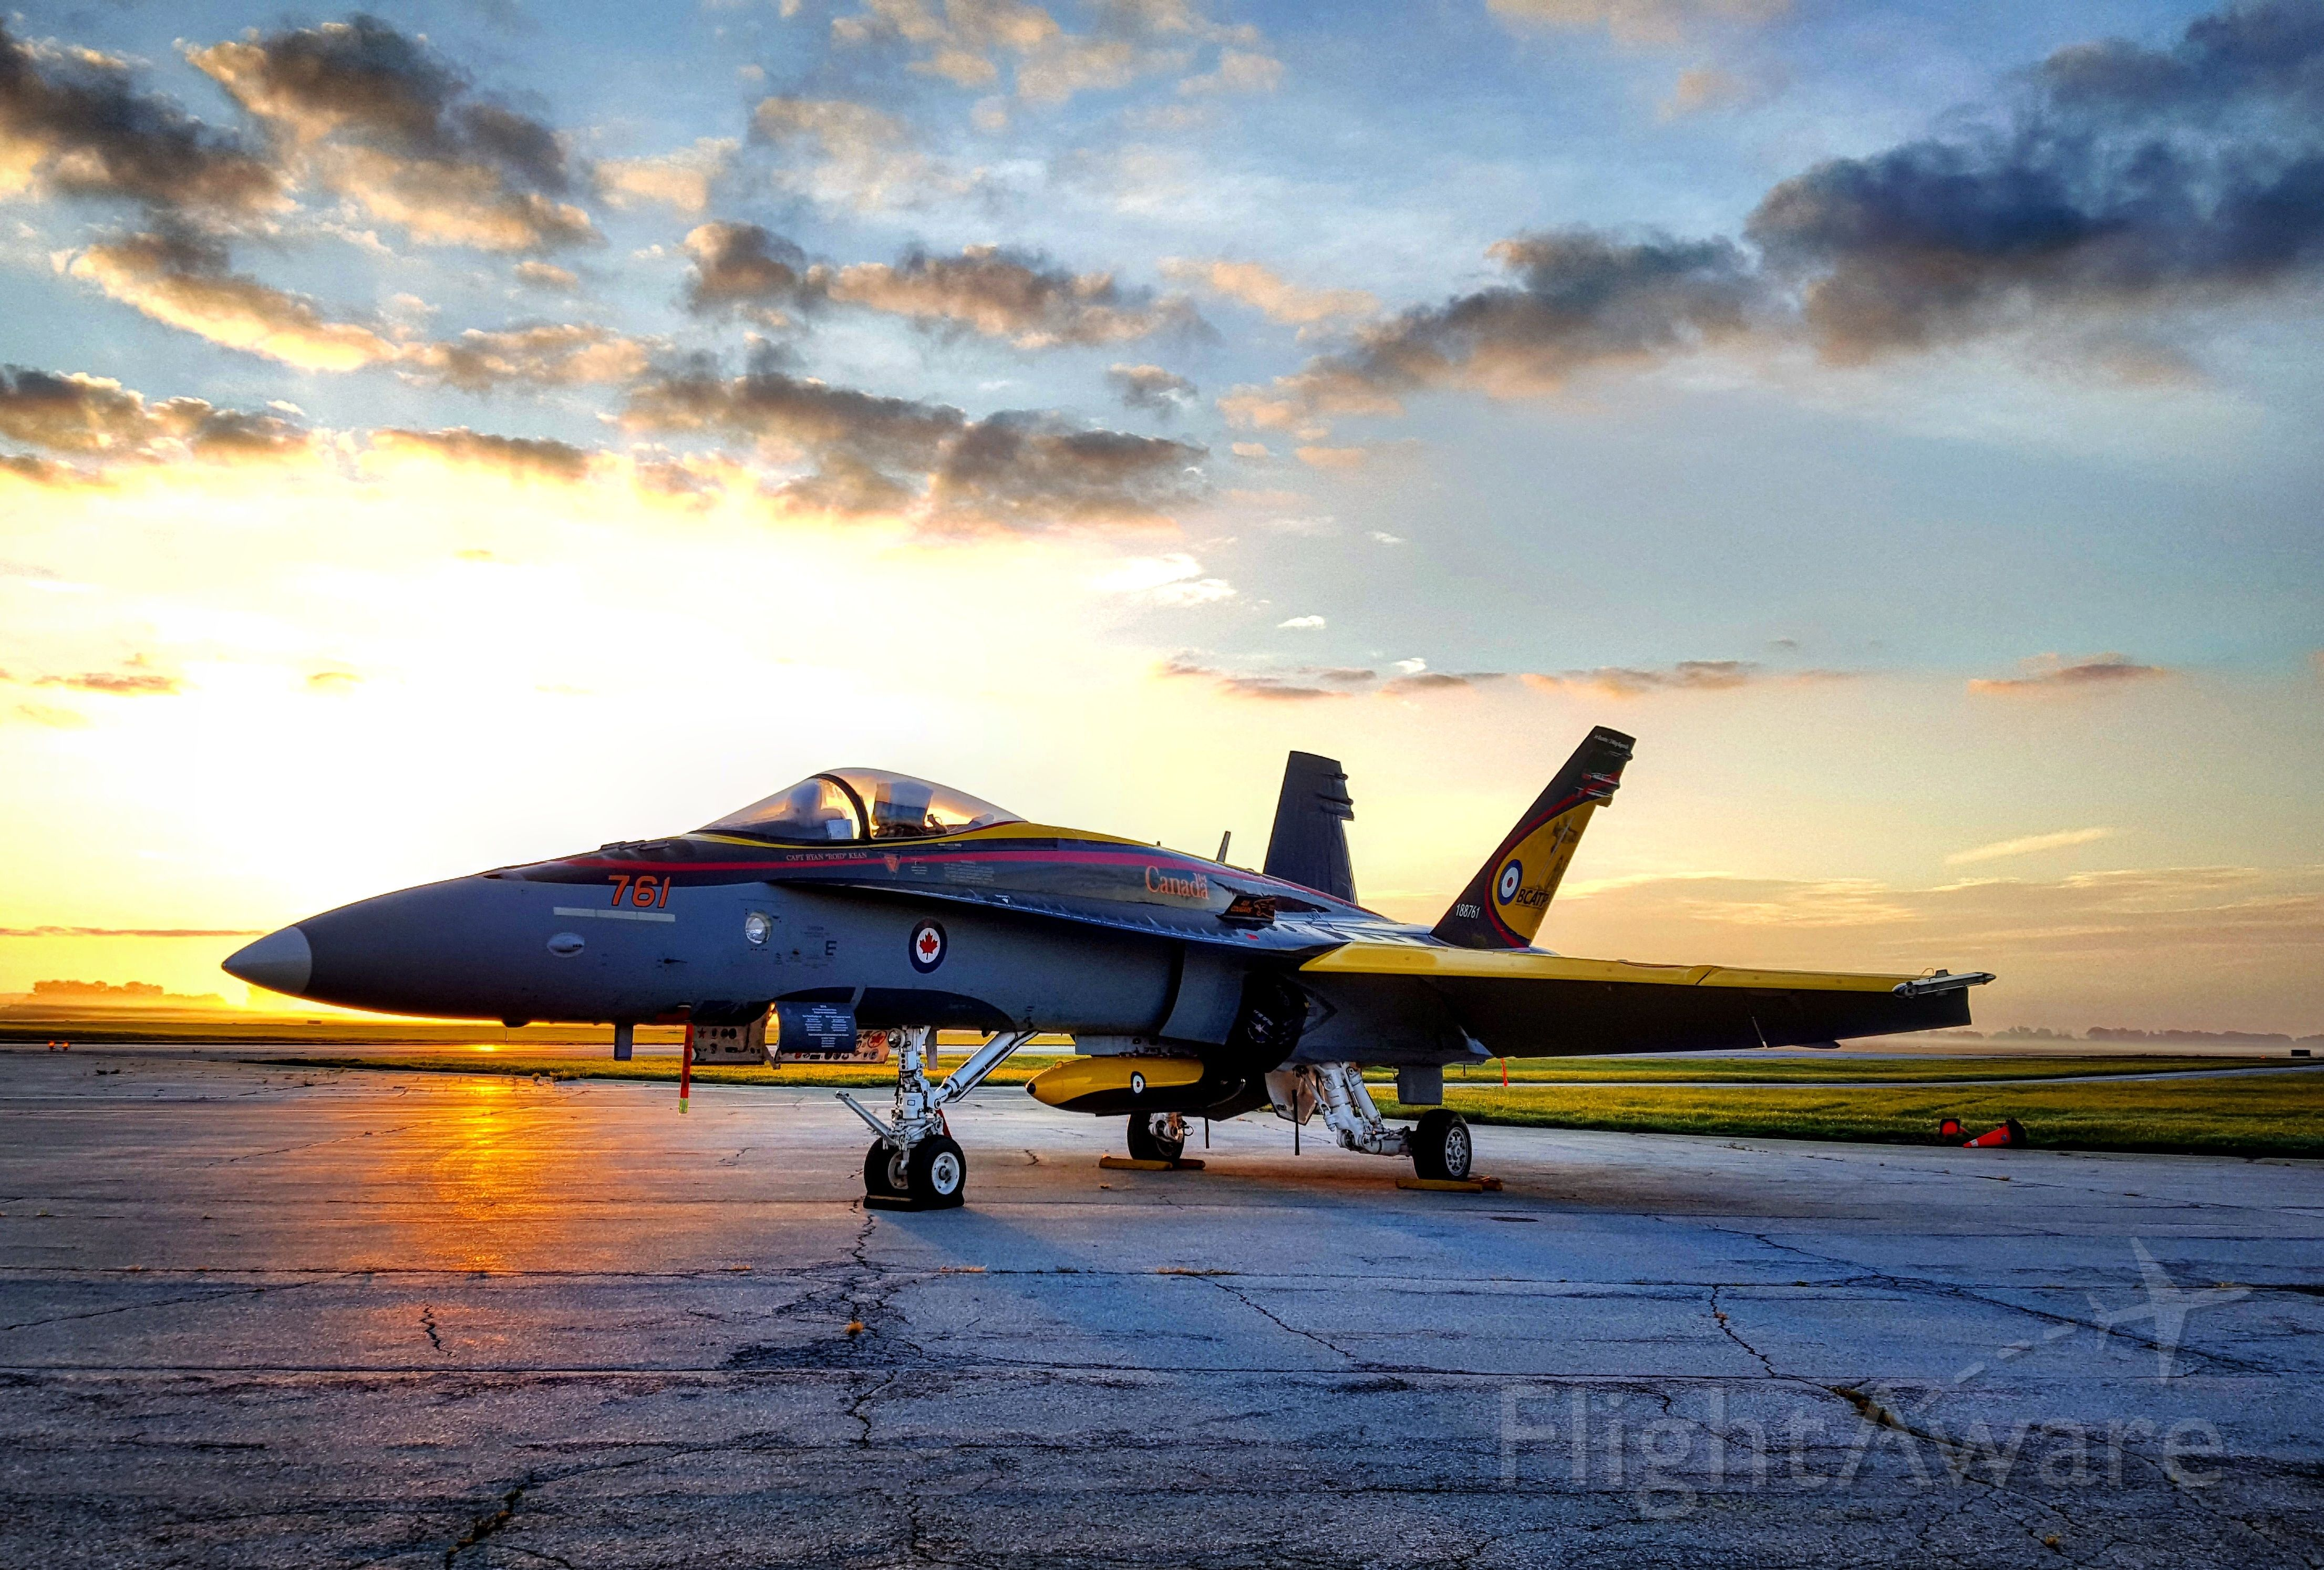 — — - 2016 CF-18 Hornet demo jet at sunrise - London Ontario Canada